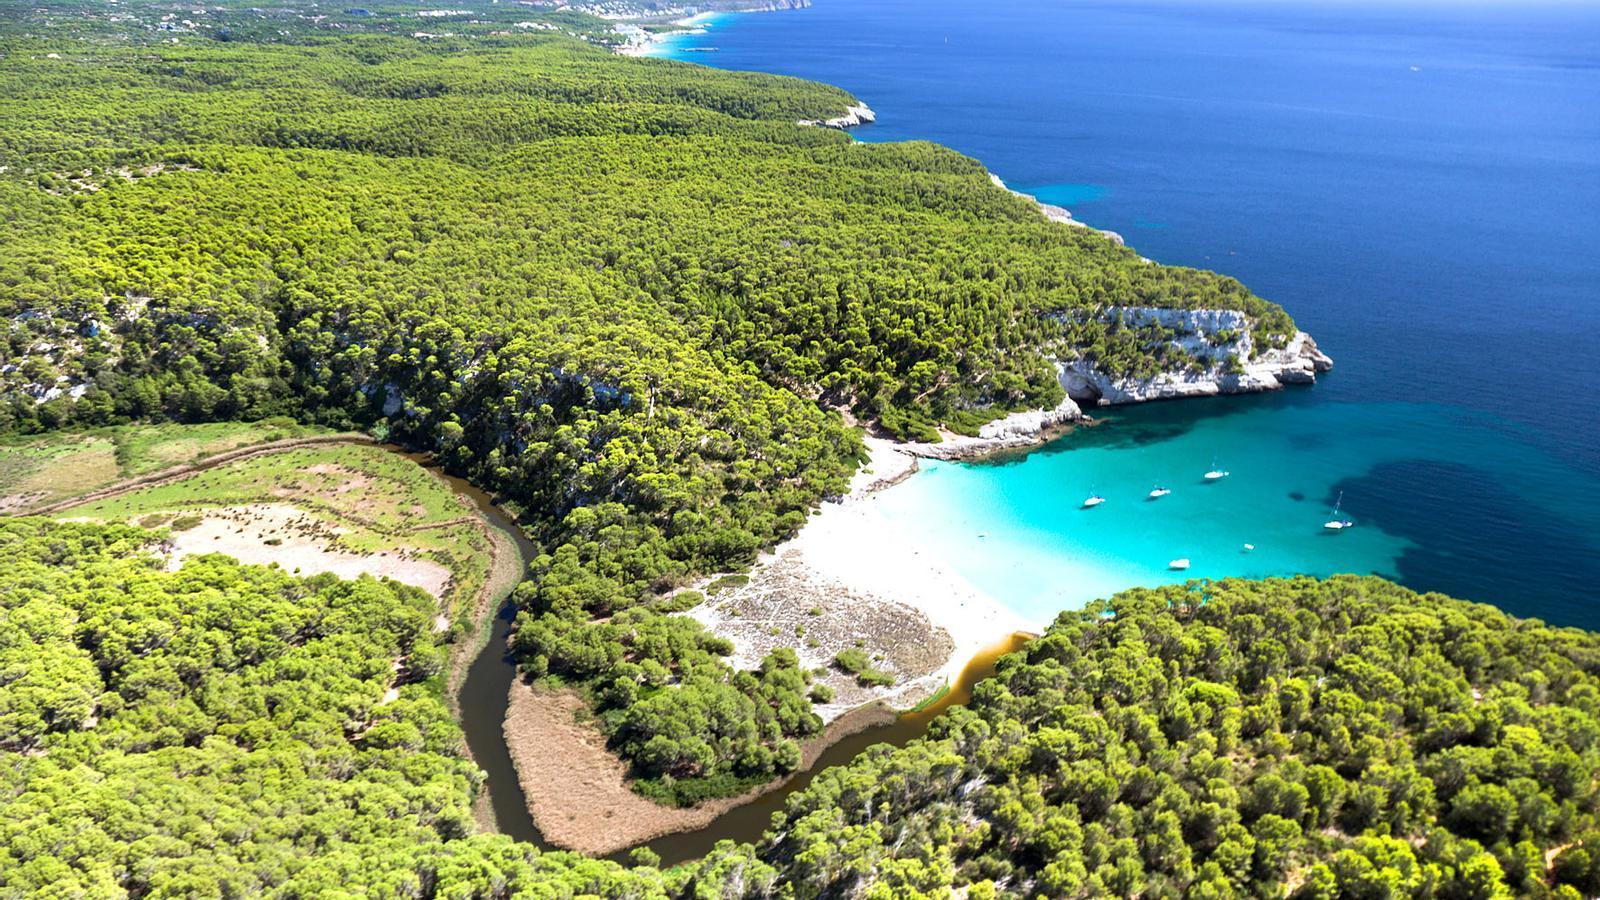 La cala verge de Trebalúger, a Menorca.